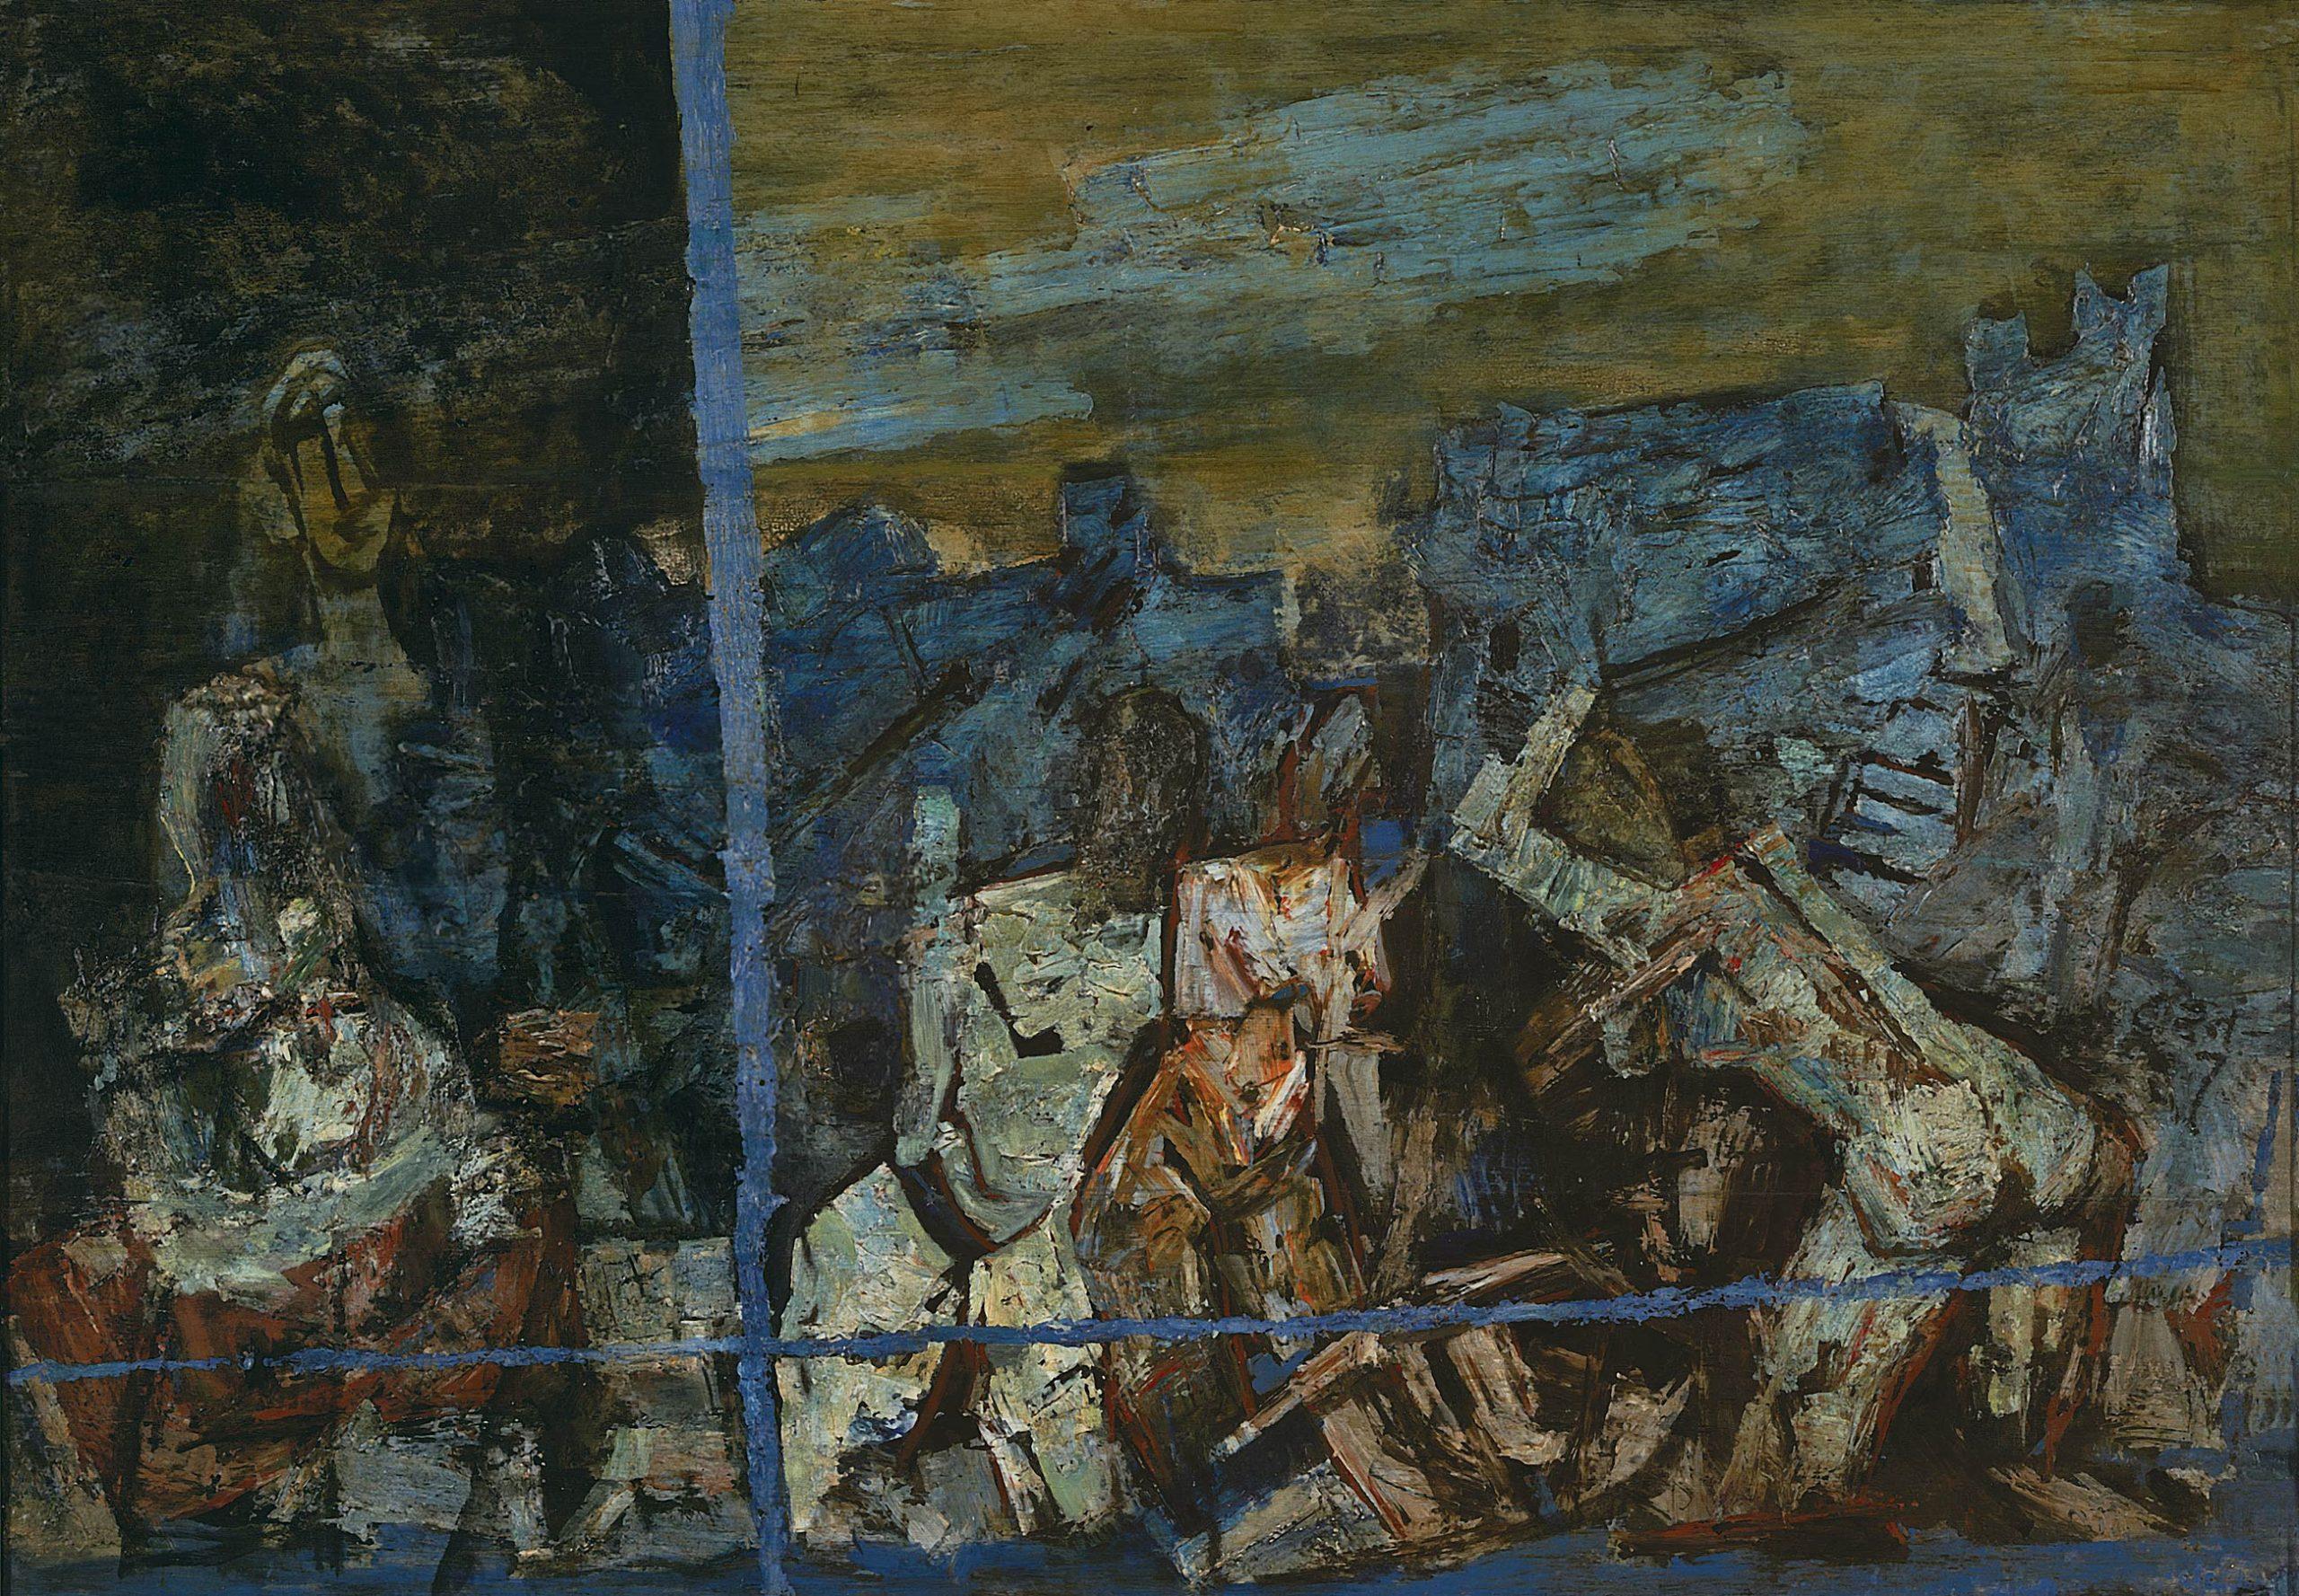 MF Husain's 'Blue Ganges' (lot 11)